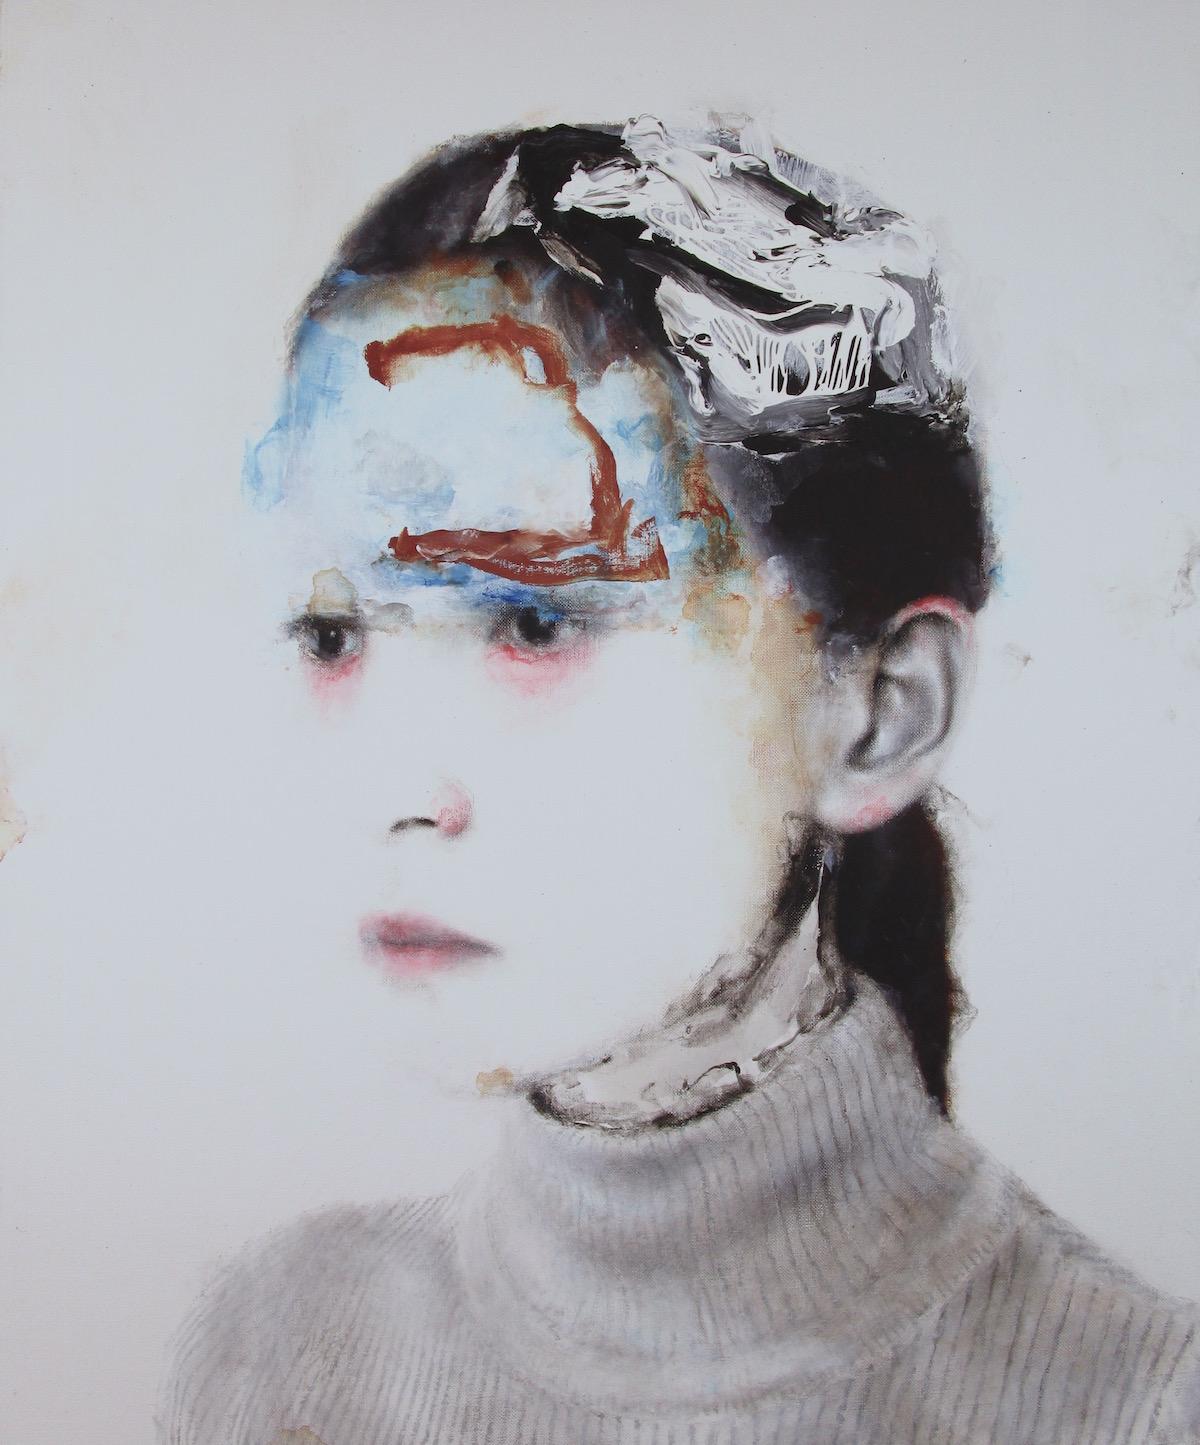 Antoine Cordet canvas toile peinture painting portrait art artist artiste peintre acrylic Good luck Vade-mecum